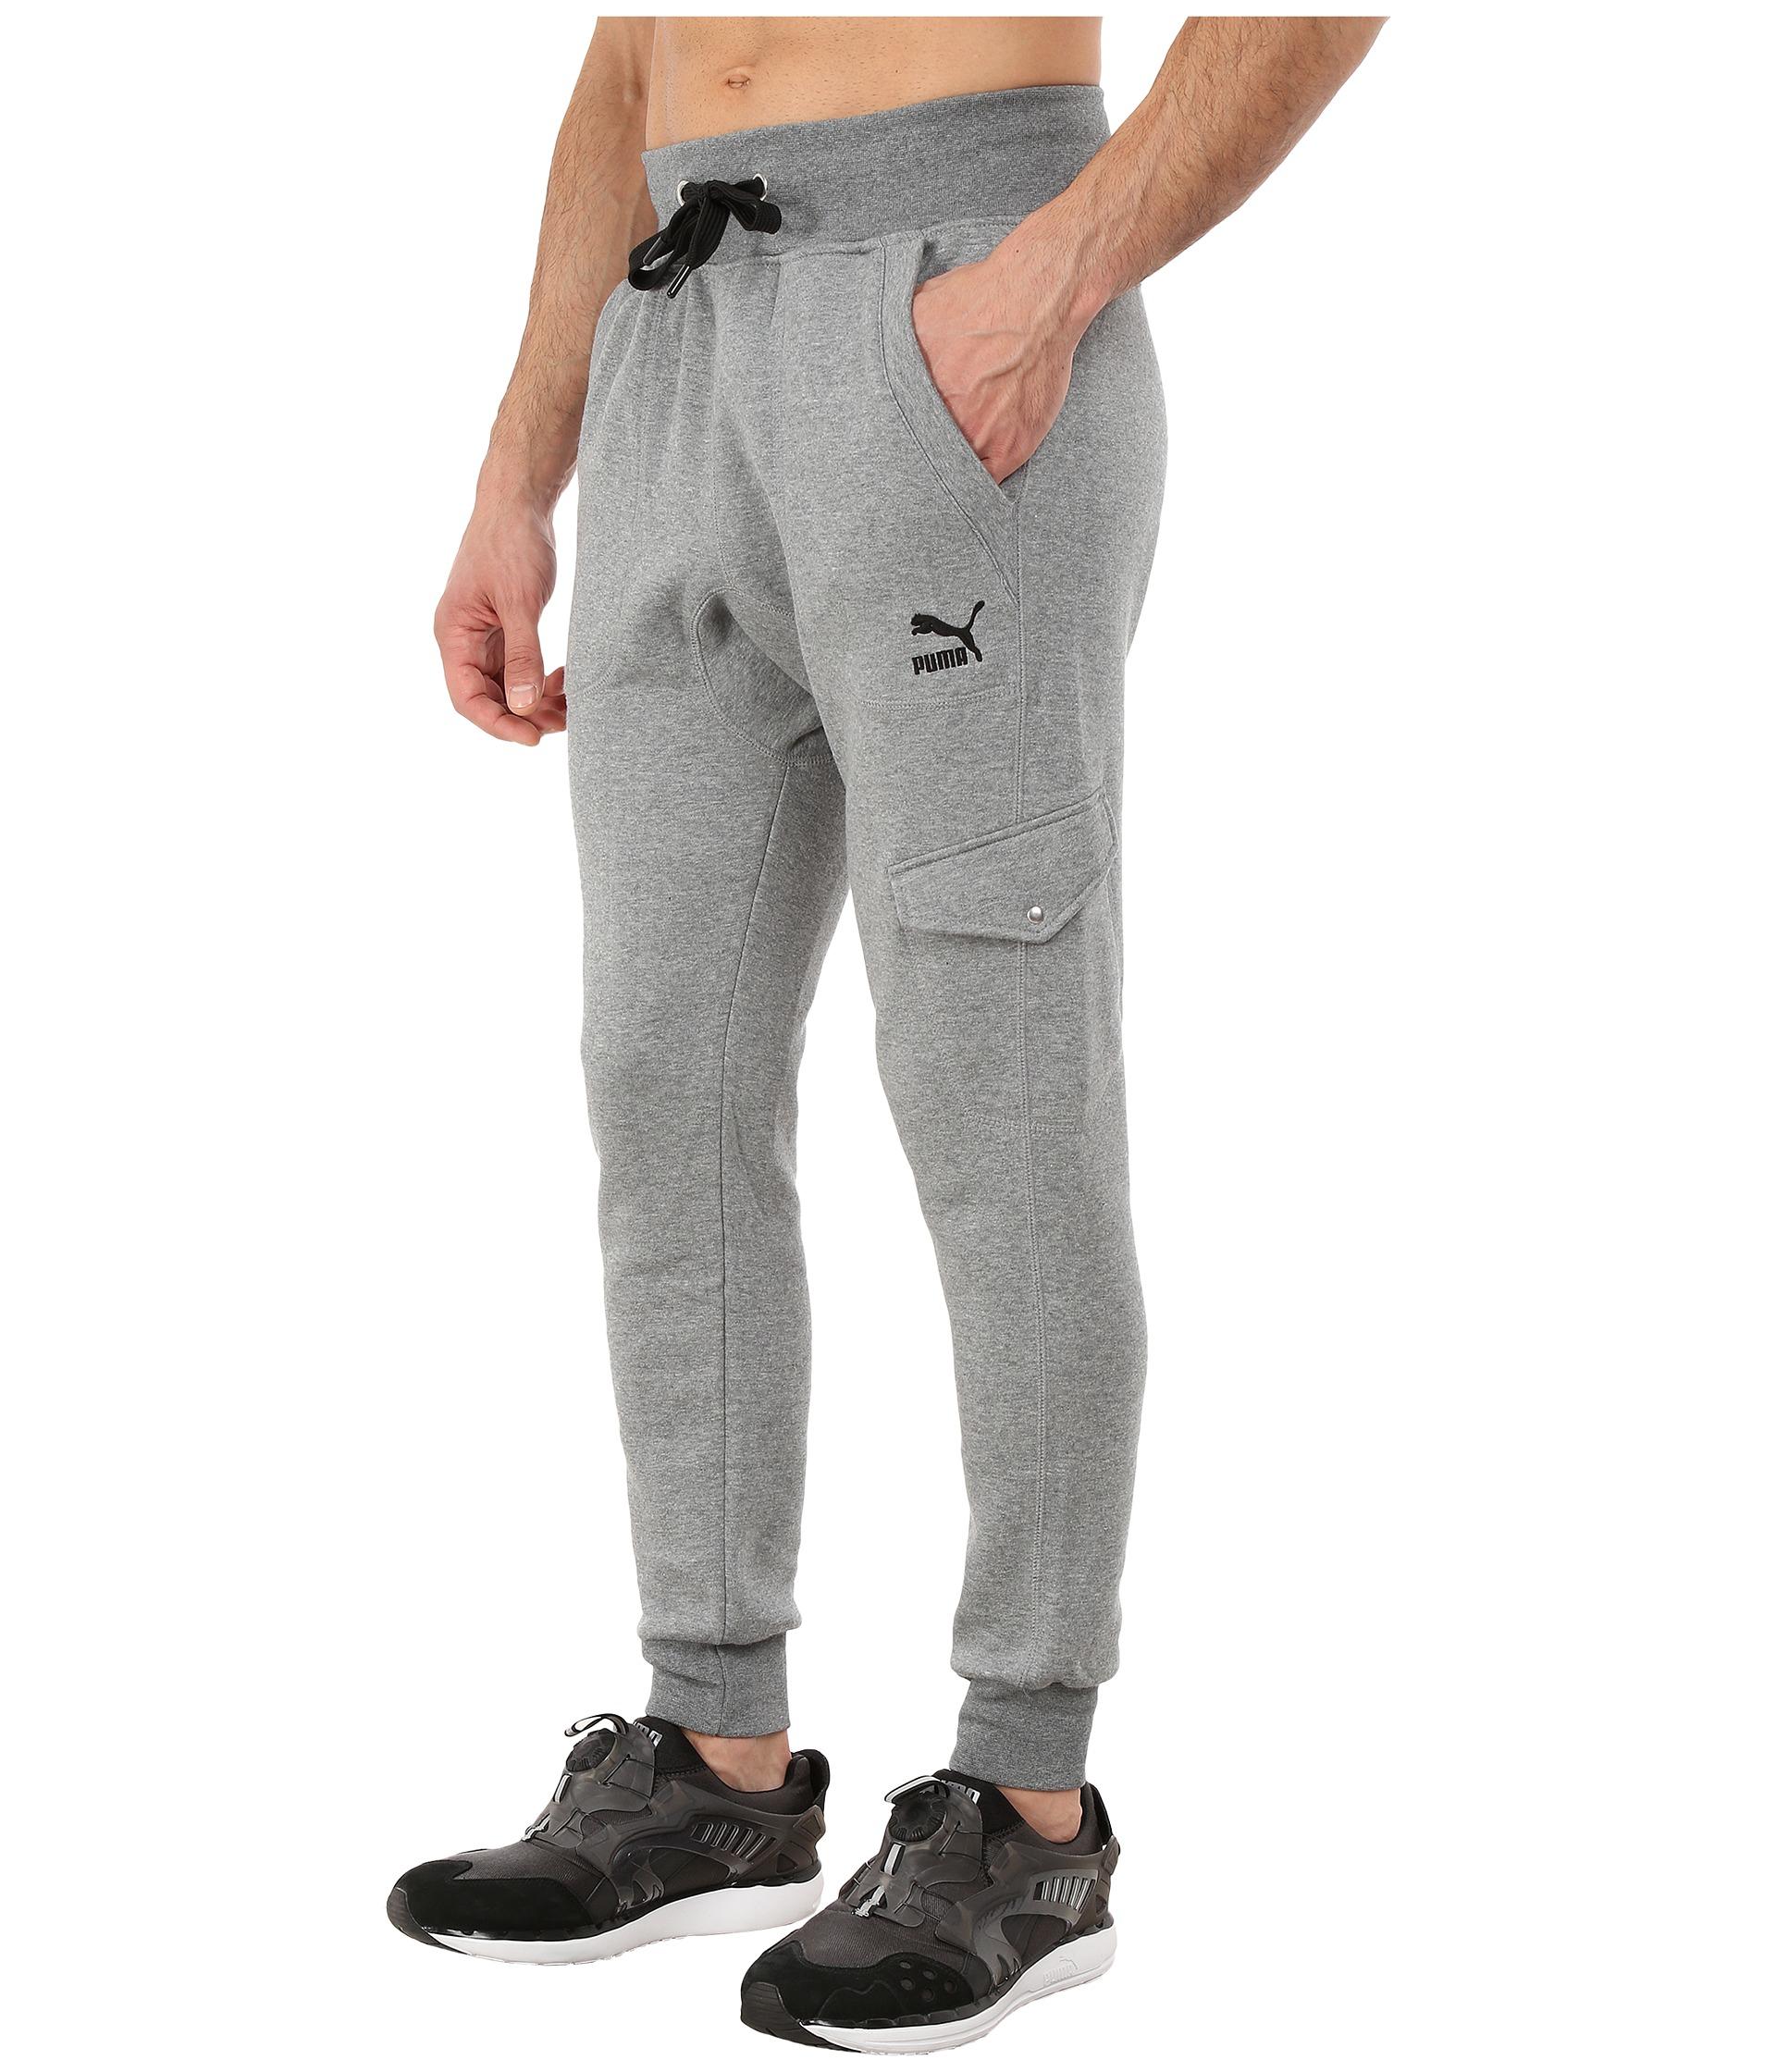 Puma Cargo Sweat Pants In Gray For Men Lyst